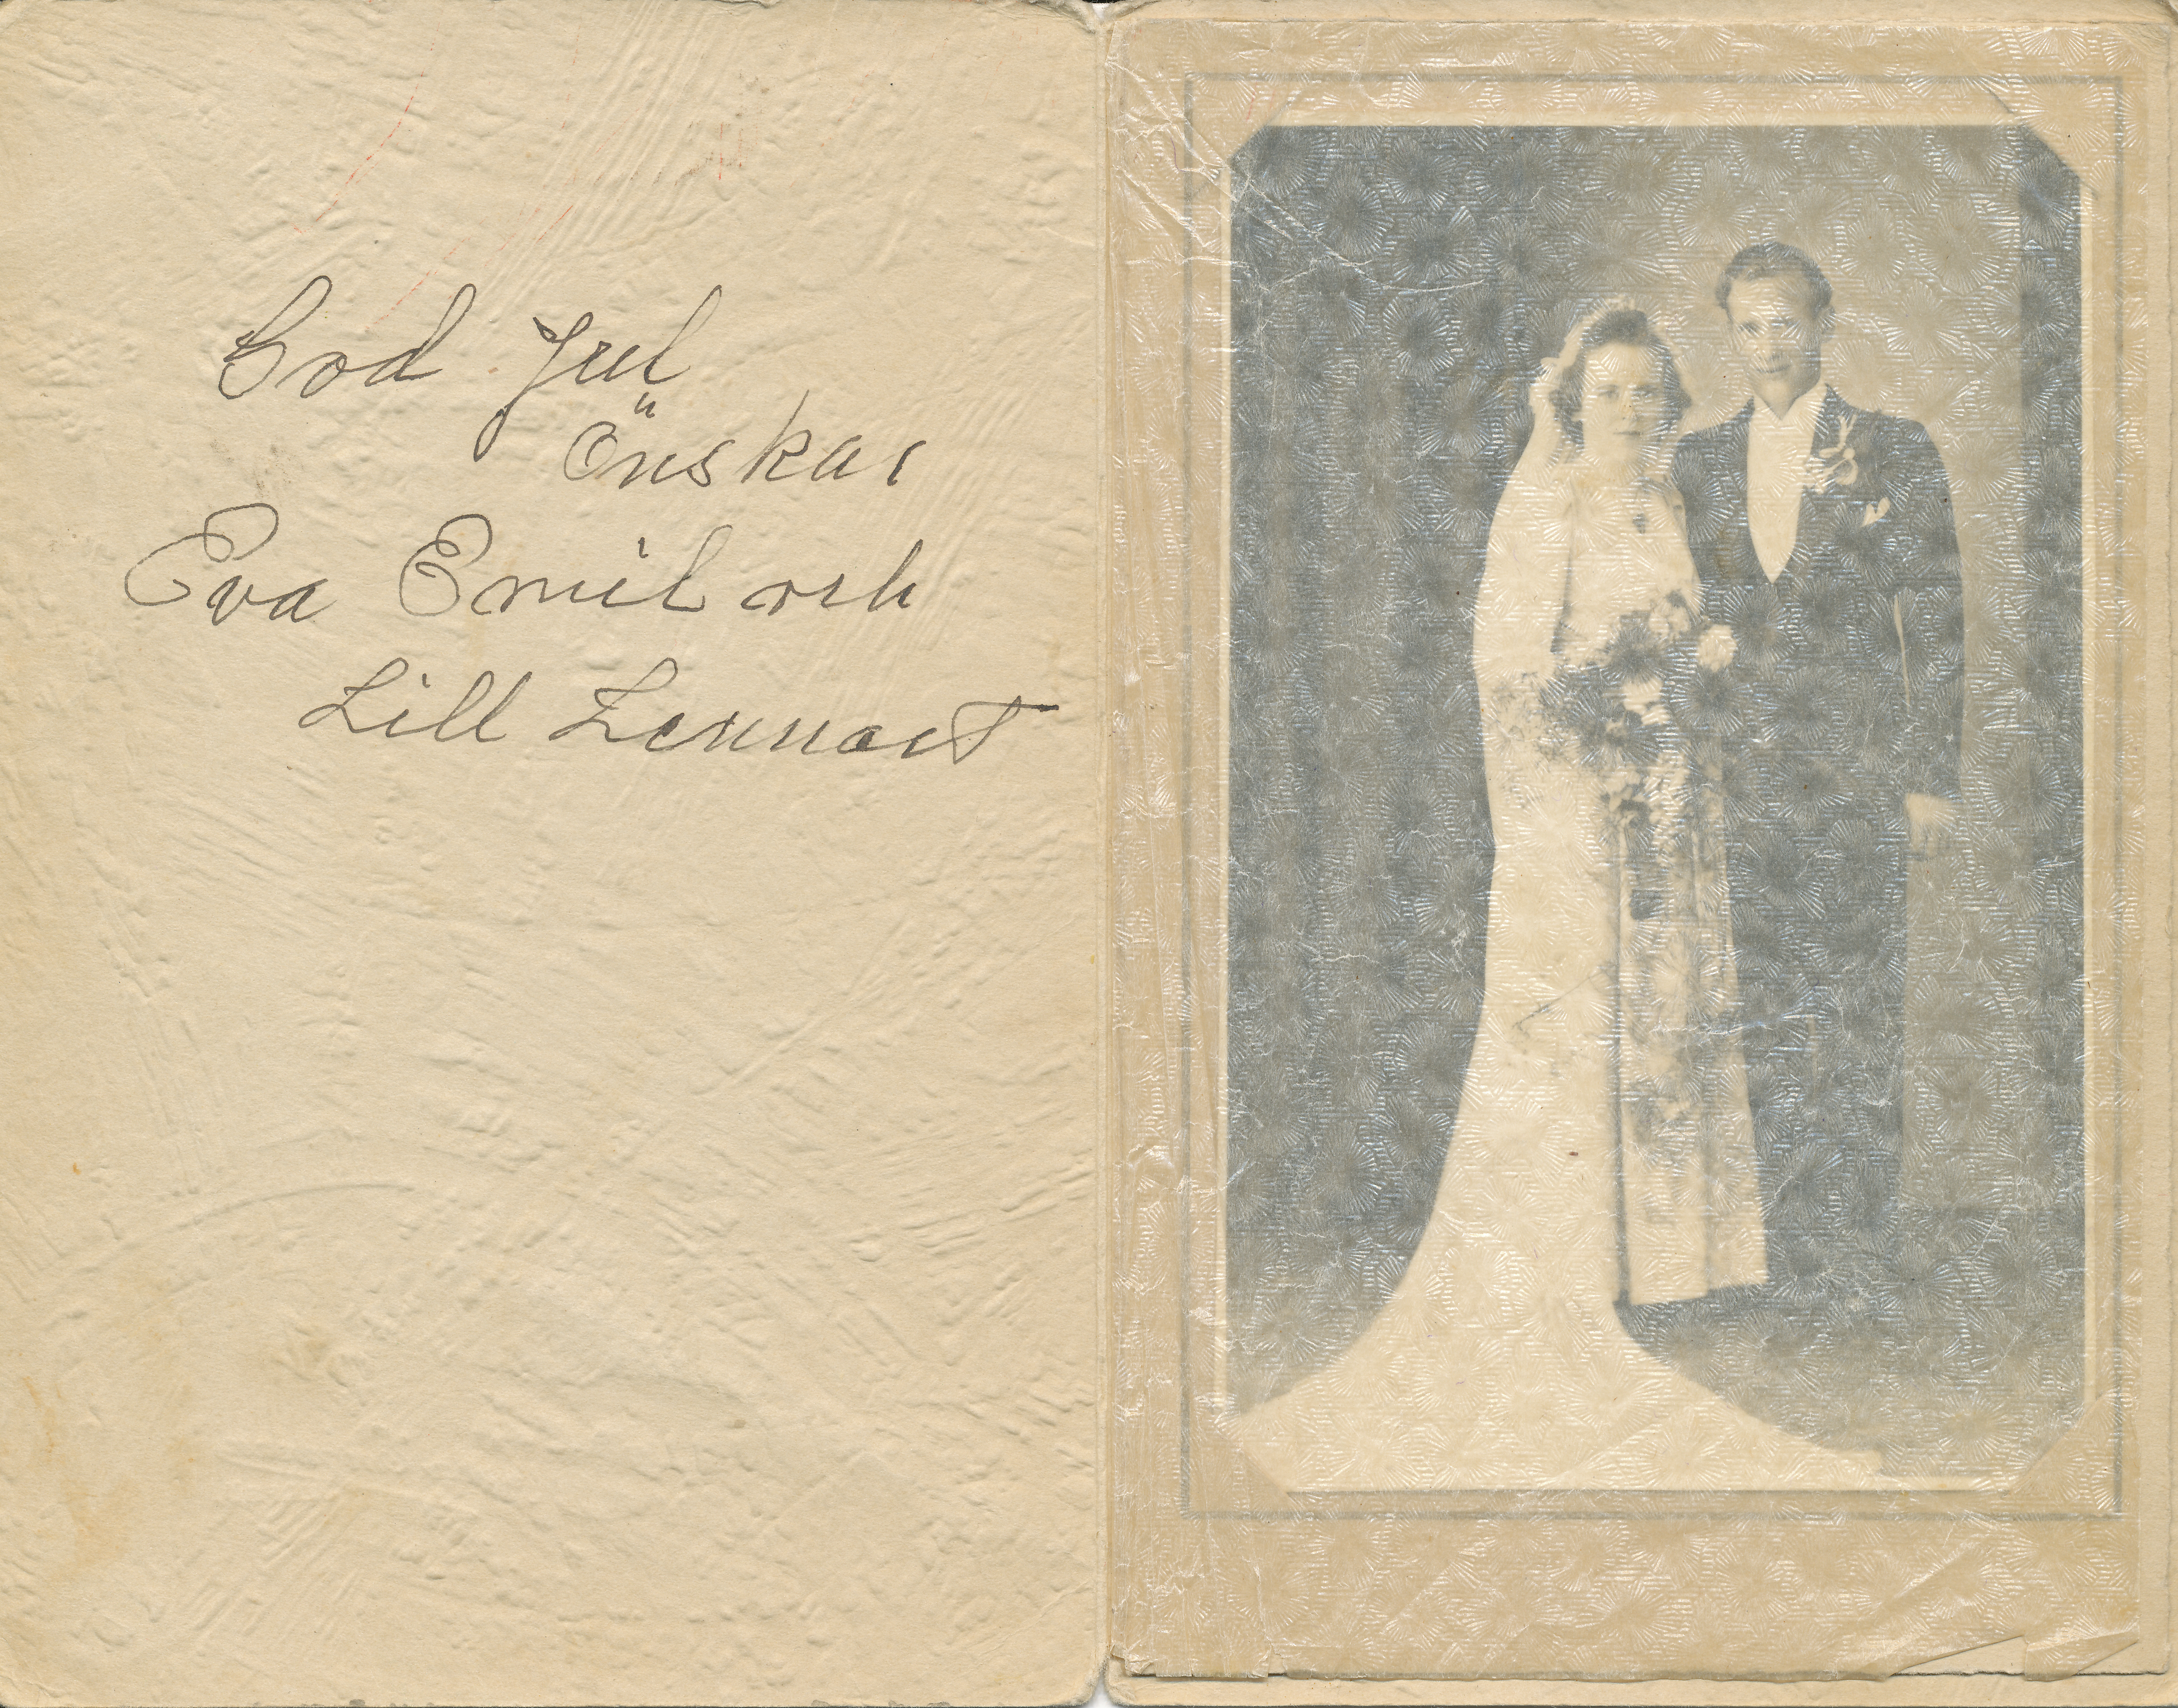 eva-norin-emil-spring-bröllop-tackkort-december-1943